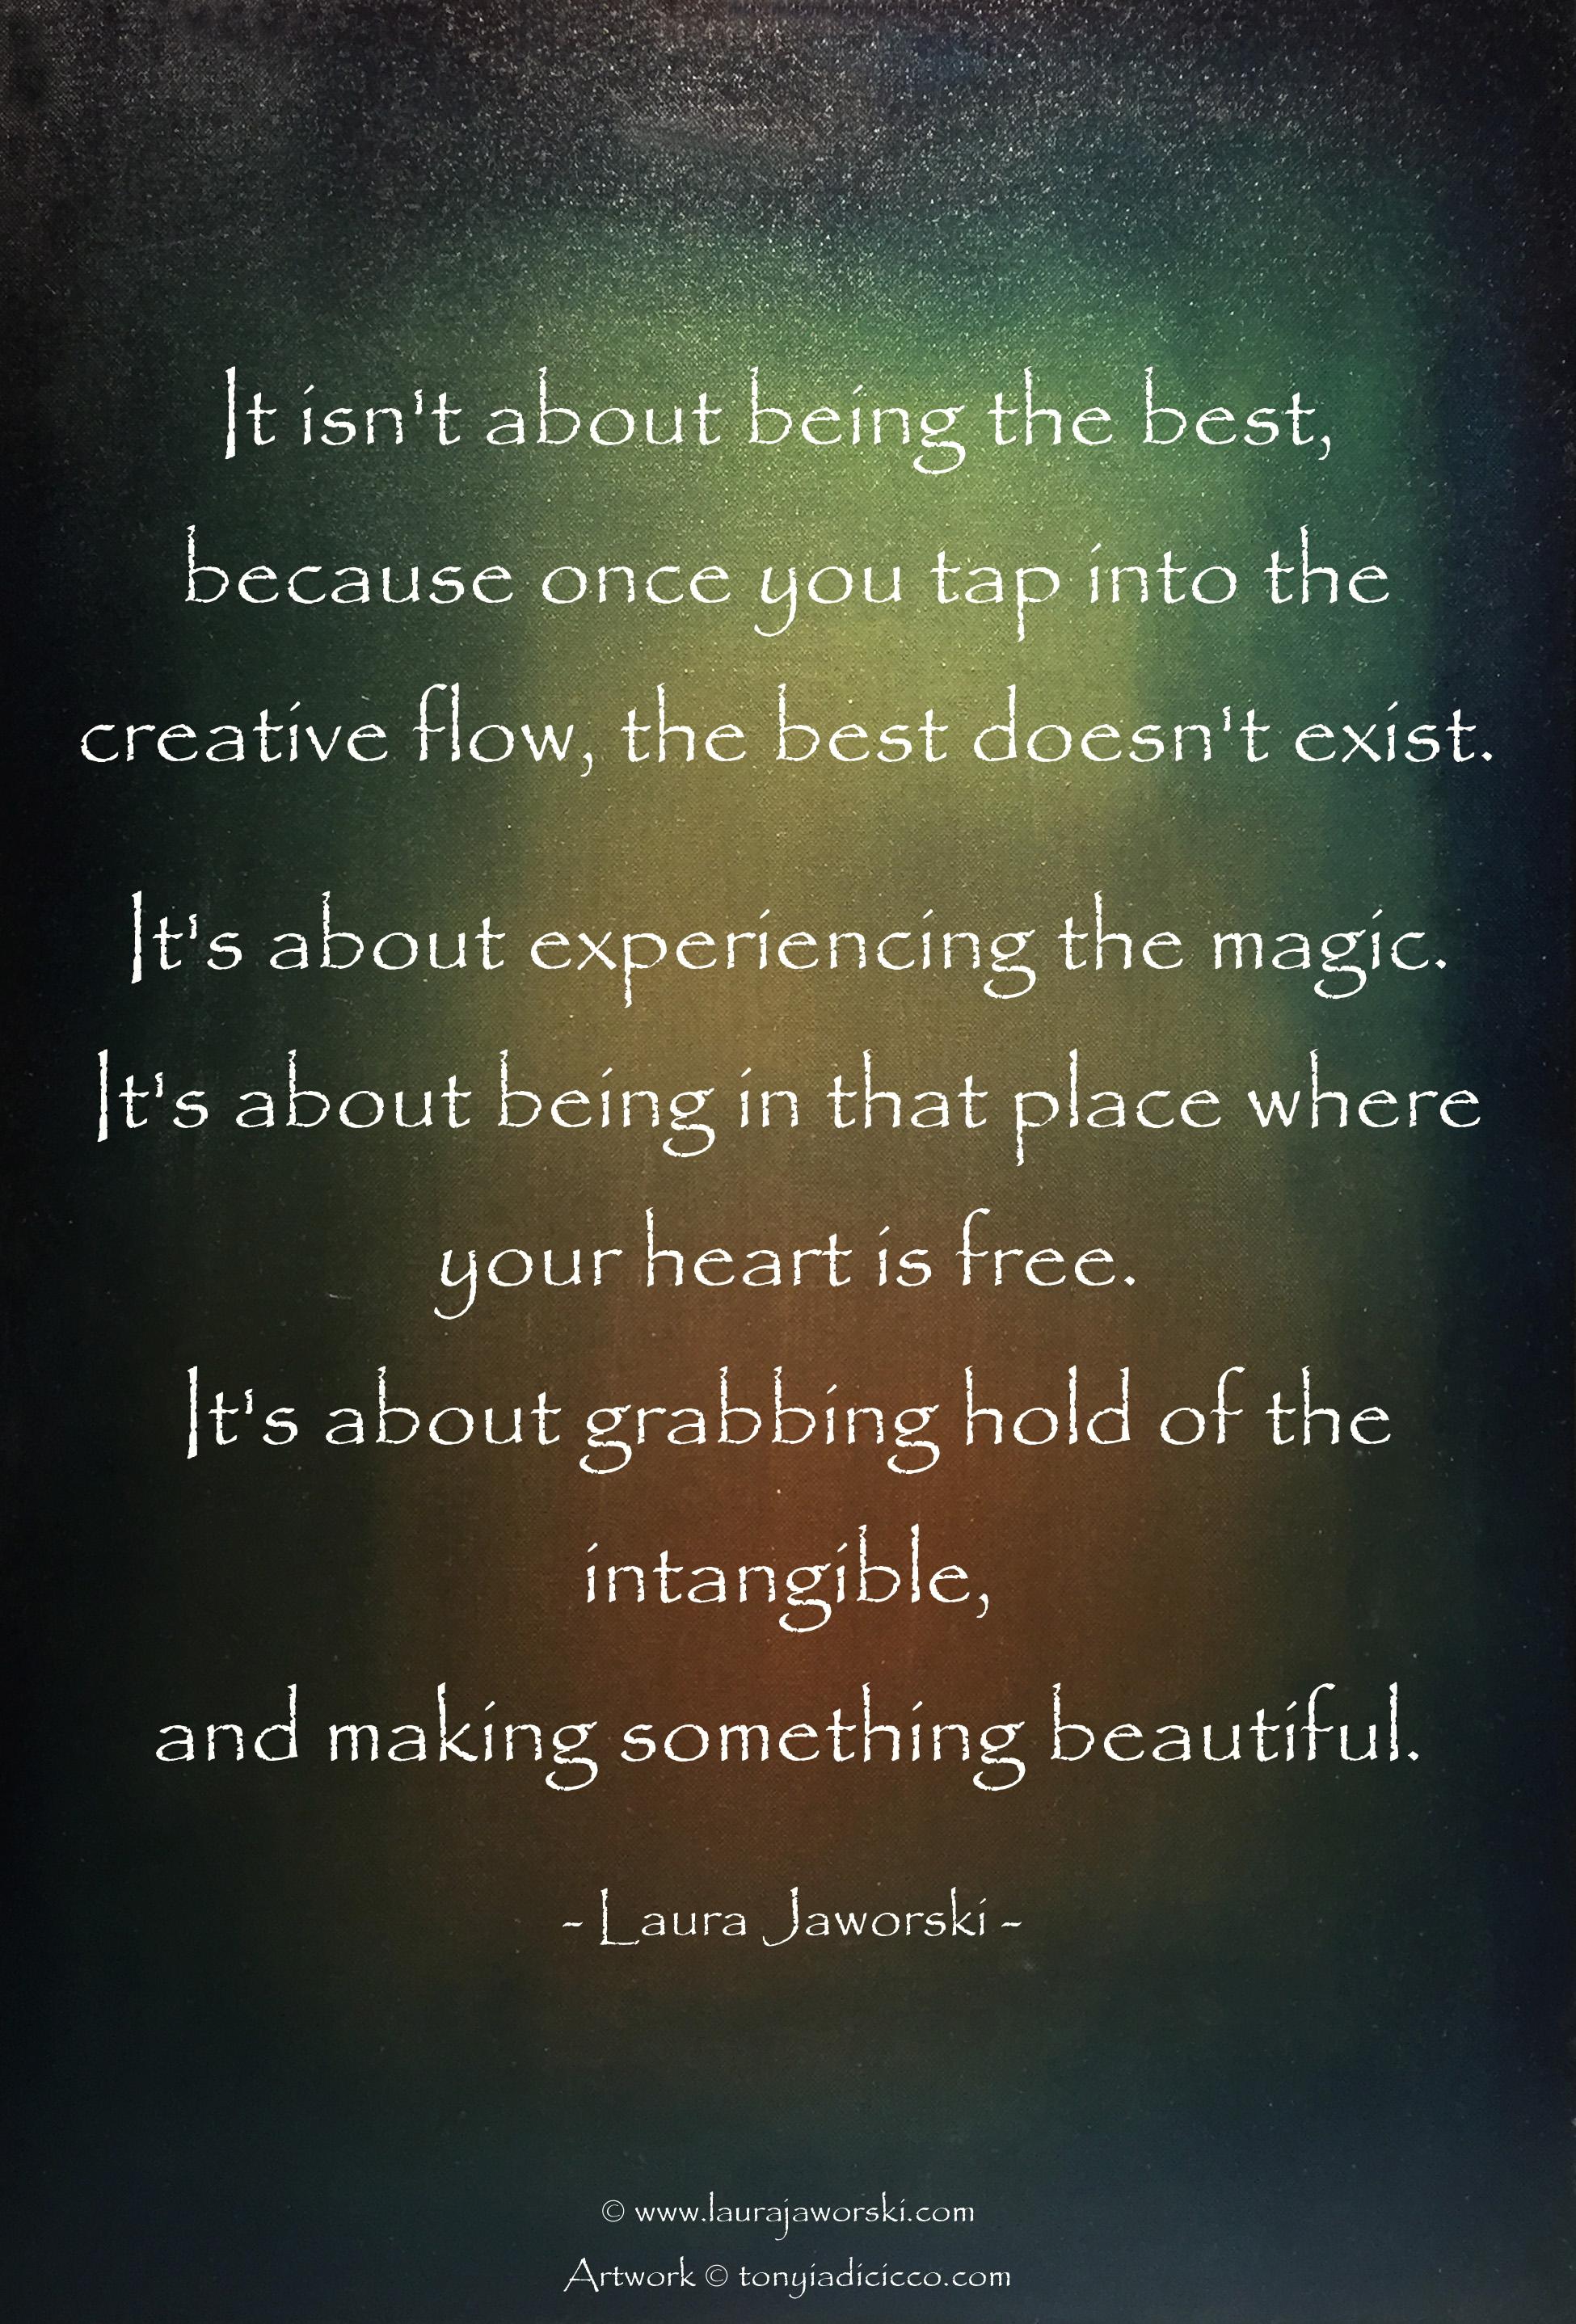 Creativity | www.laurajawori.com